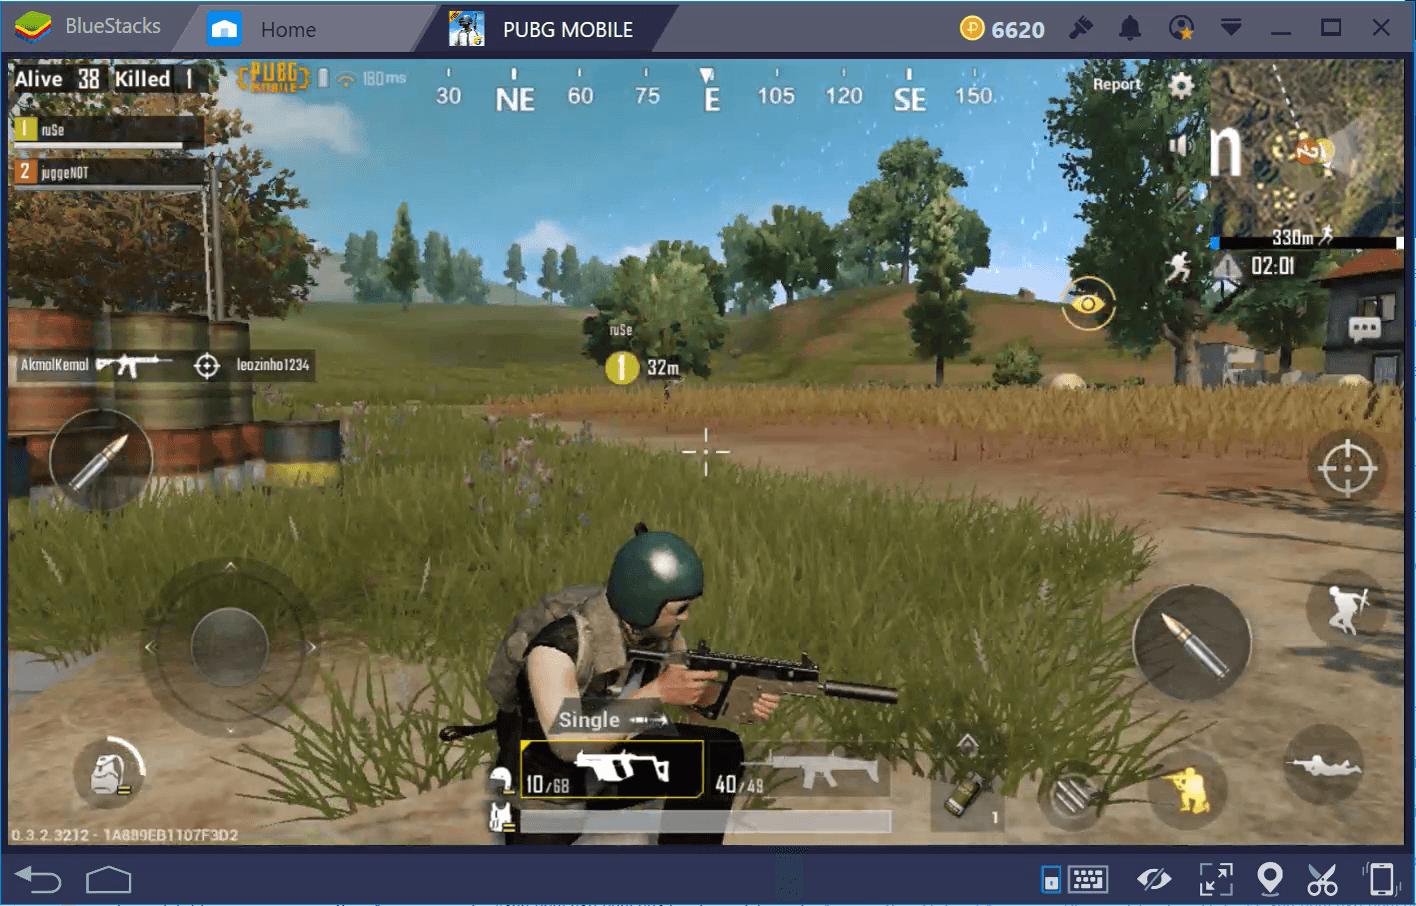 Ultimate PUBG Mobile Weapon Guide | BlueStacks